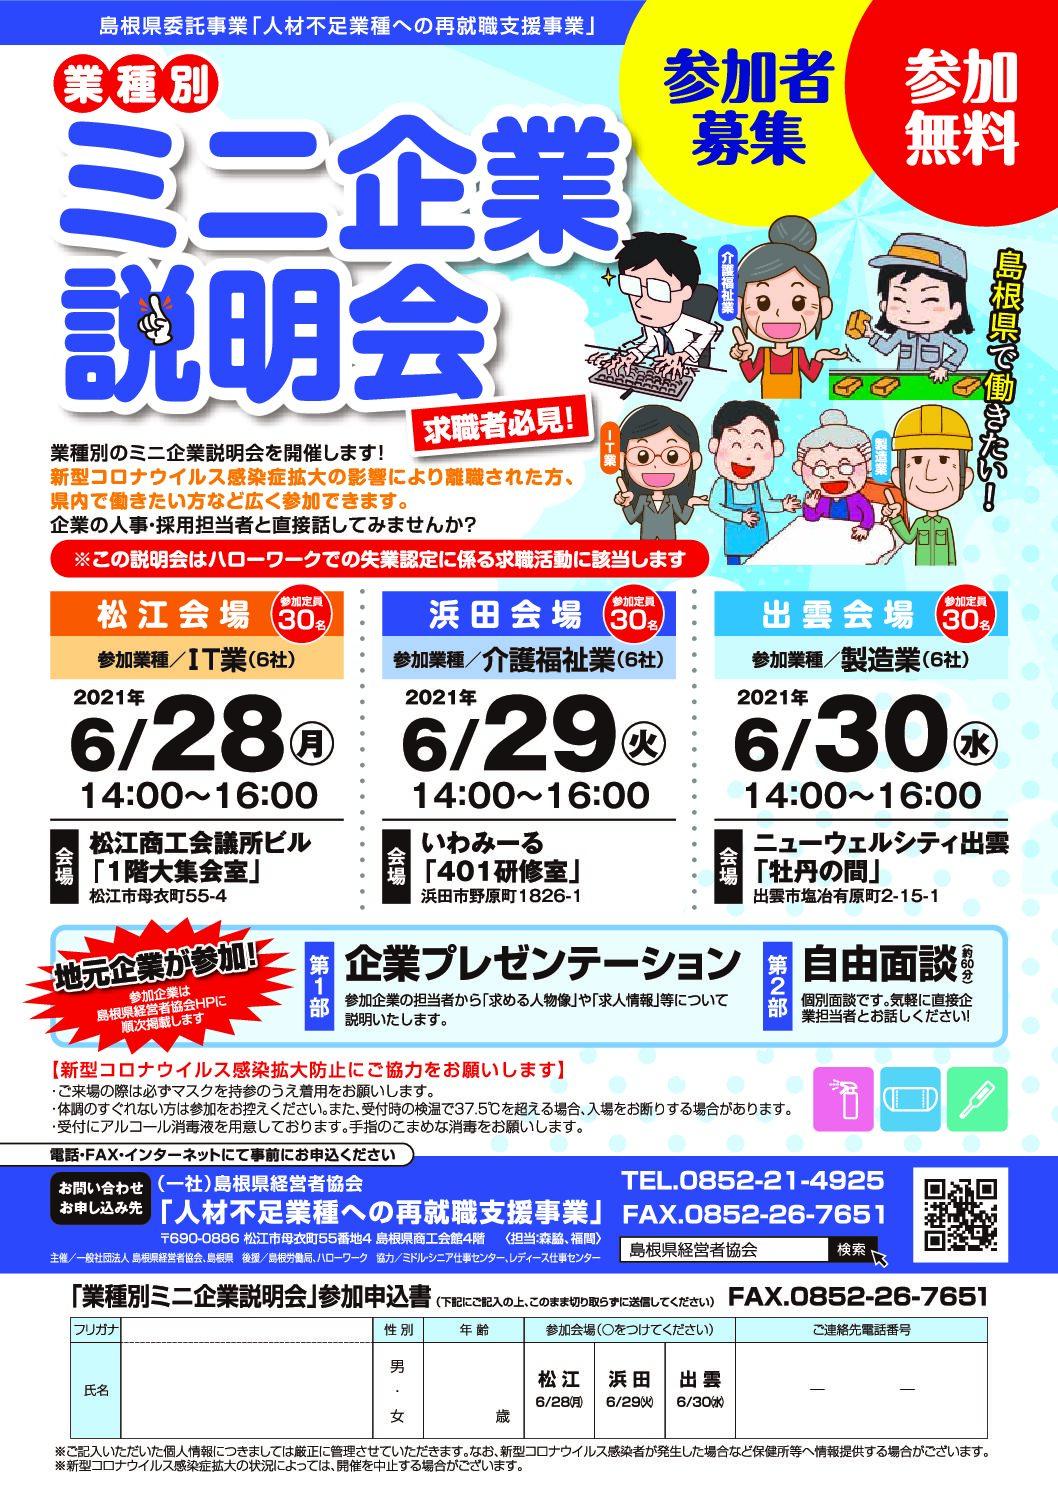 「業種別ミニ企業説明会(浜田会場:介護福祉業)」チラシ